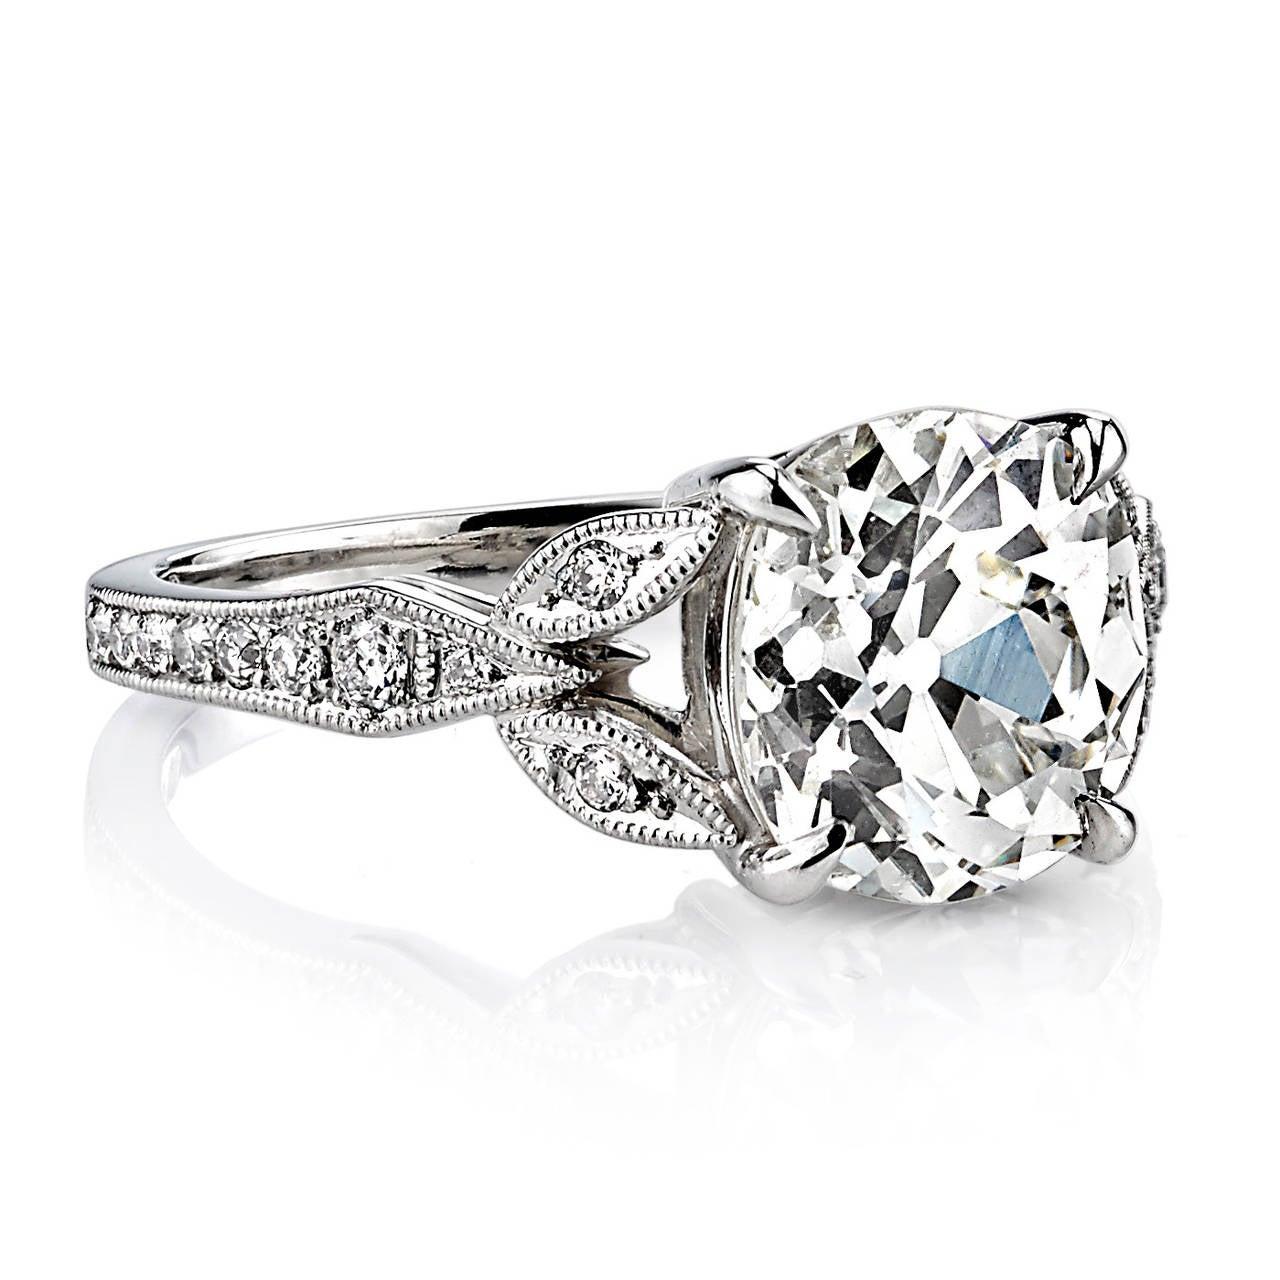 2 92 Carat GIA Cert Cushion Cut Diamond Platinum Engagement Ring at 1stdibs